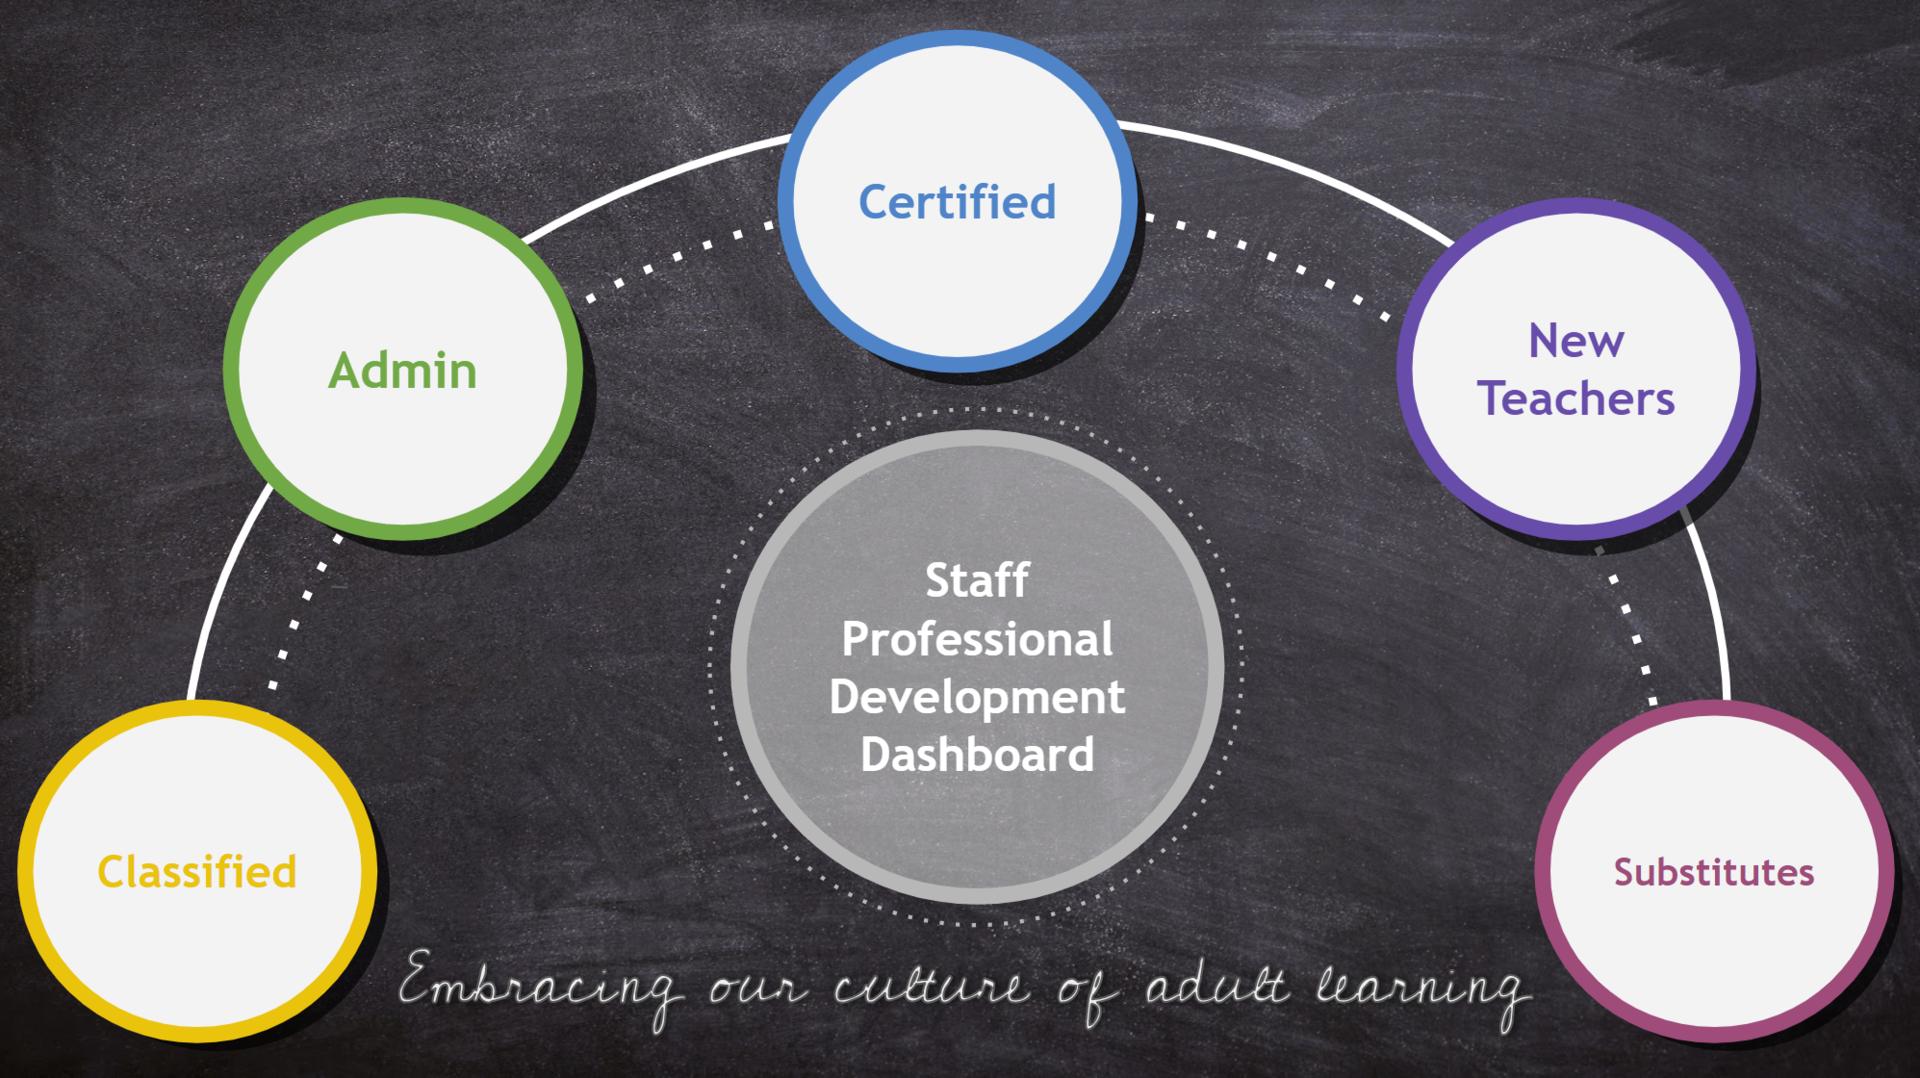 Professional Development Dashboard page